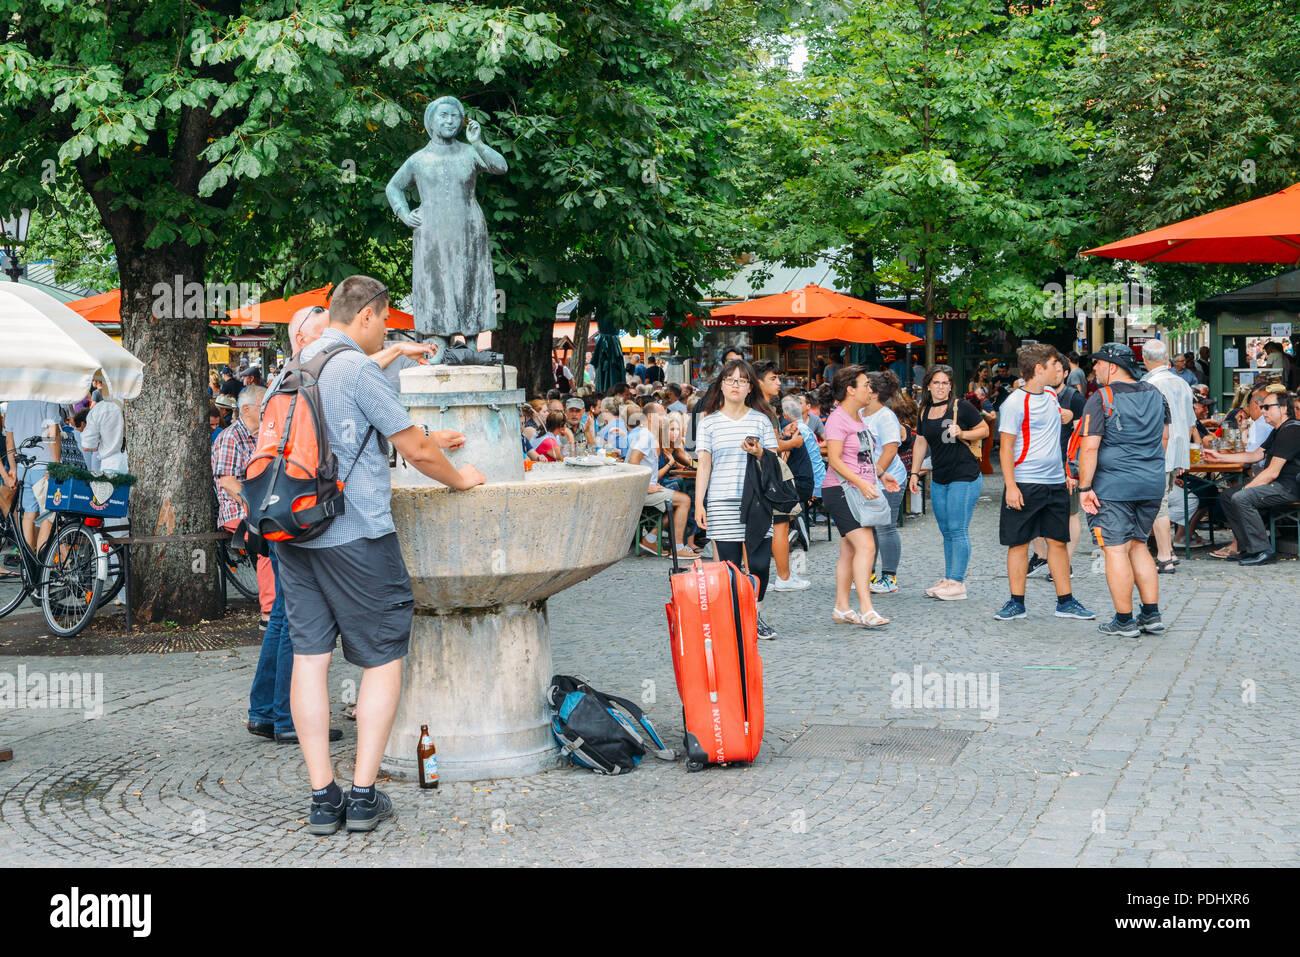 Munich, Germany - July 29, 2018: Tourists next to statue of actress Liesl Karl Town at Munich's Viktualienmarkt - Stock Image